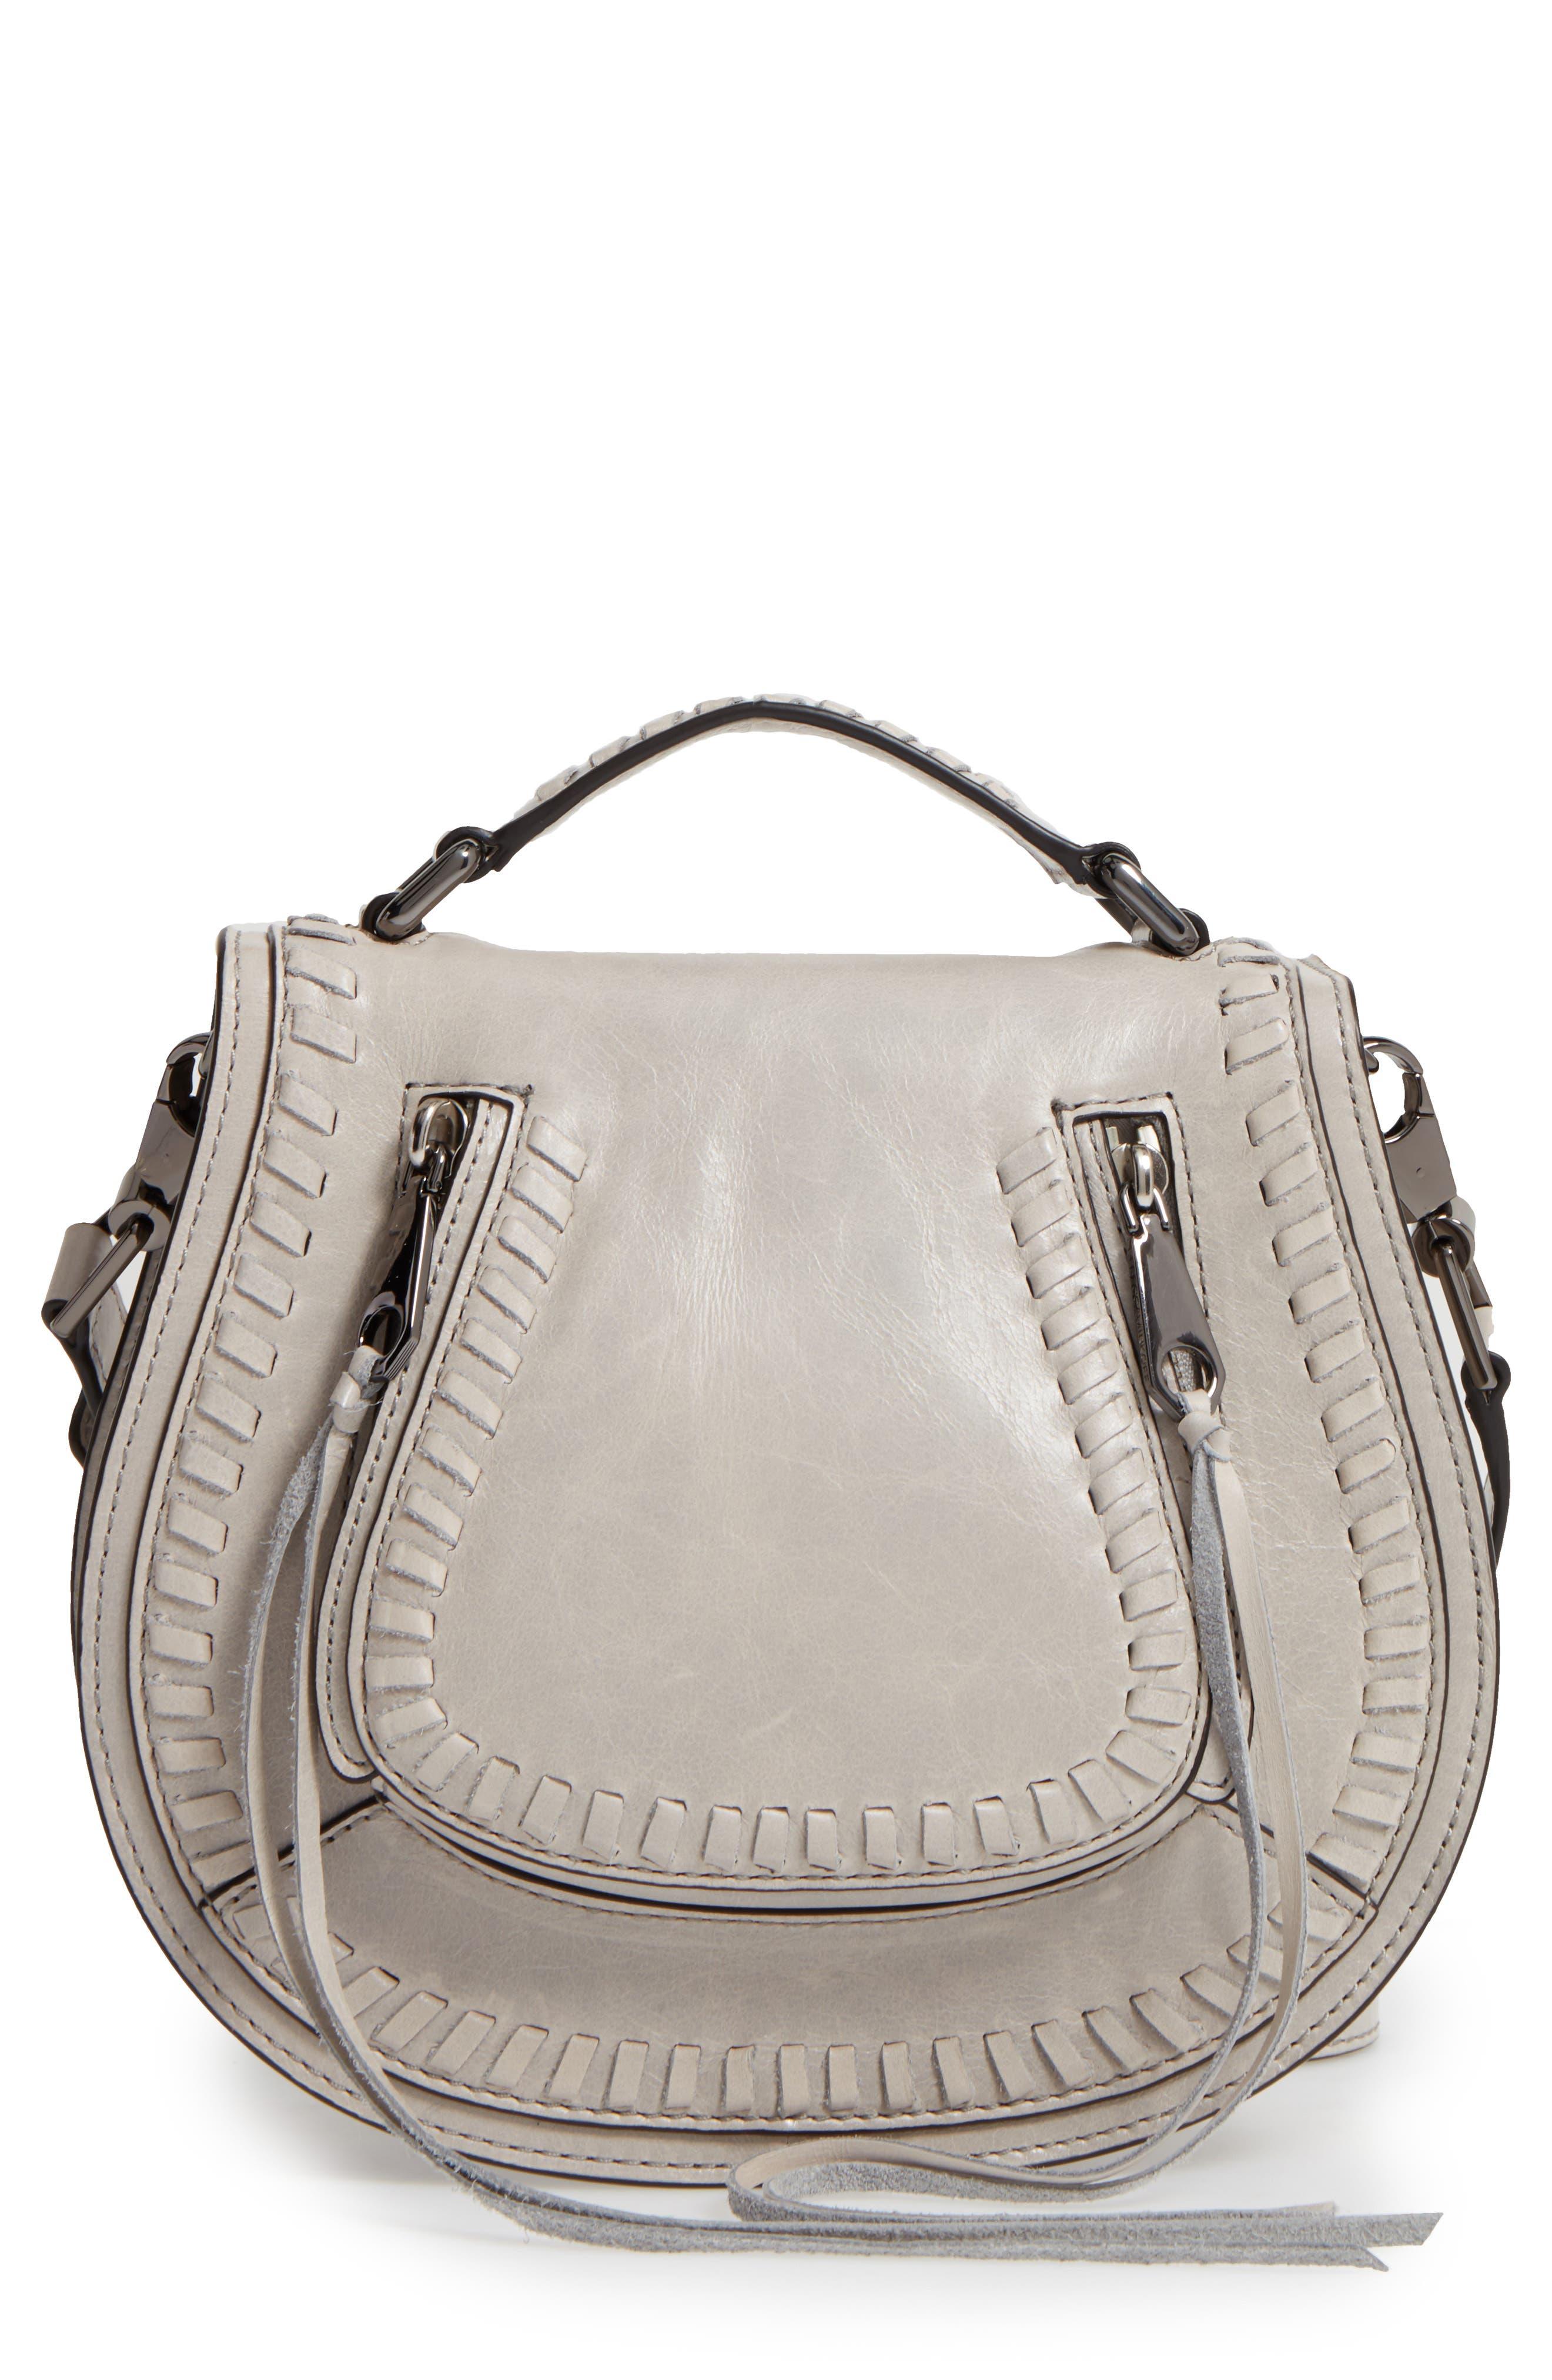 Main Image - Rebecca Minkoff Small Vanity Leather Saddle Bag